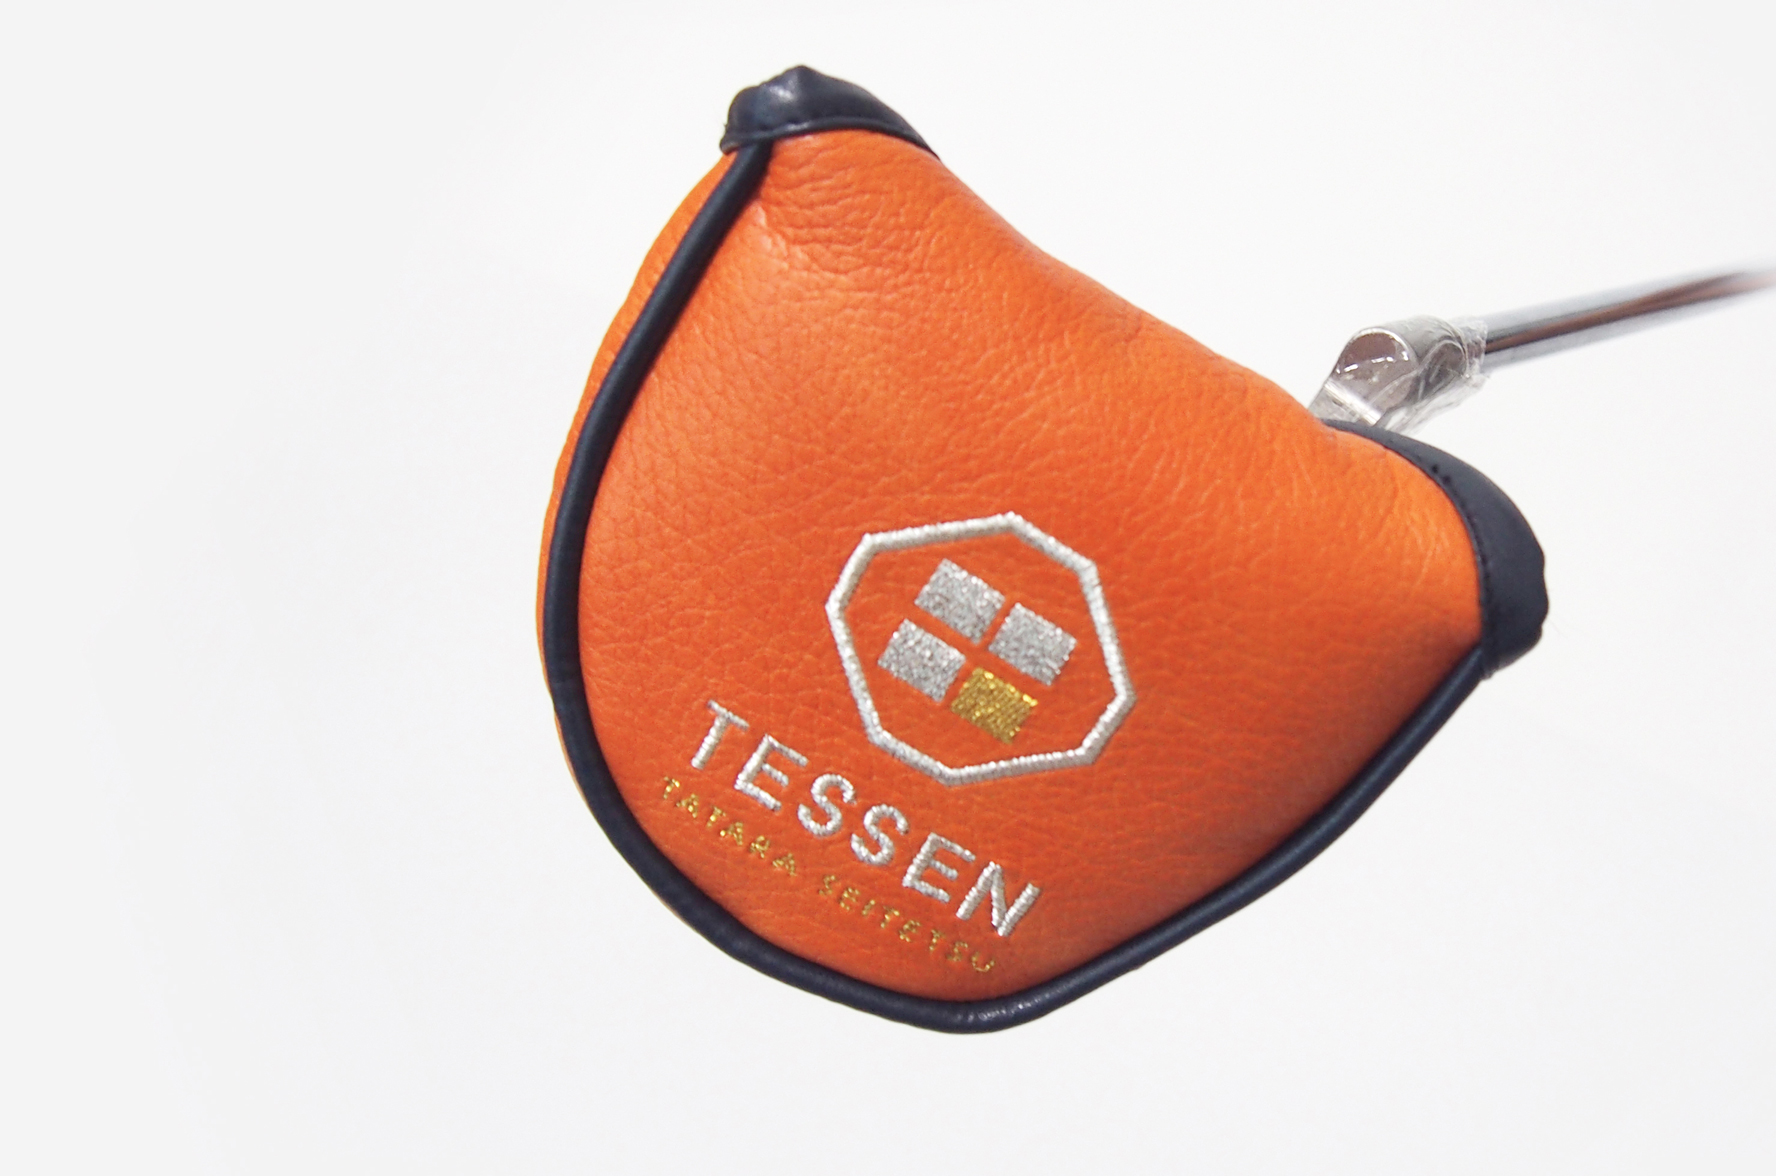 TESSEN ゴルフパター(6)